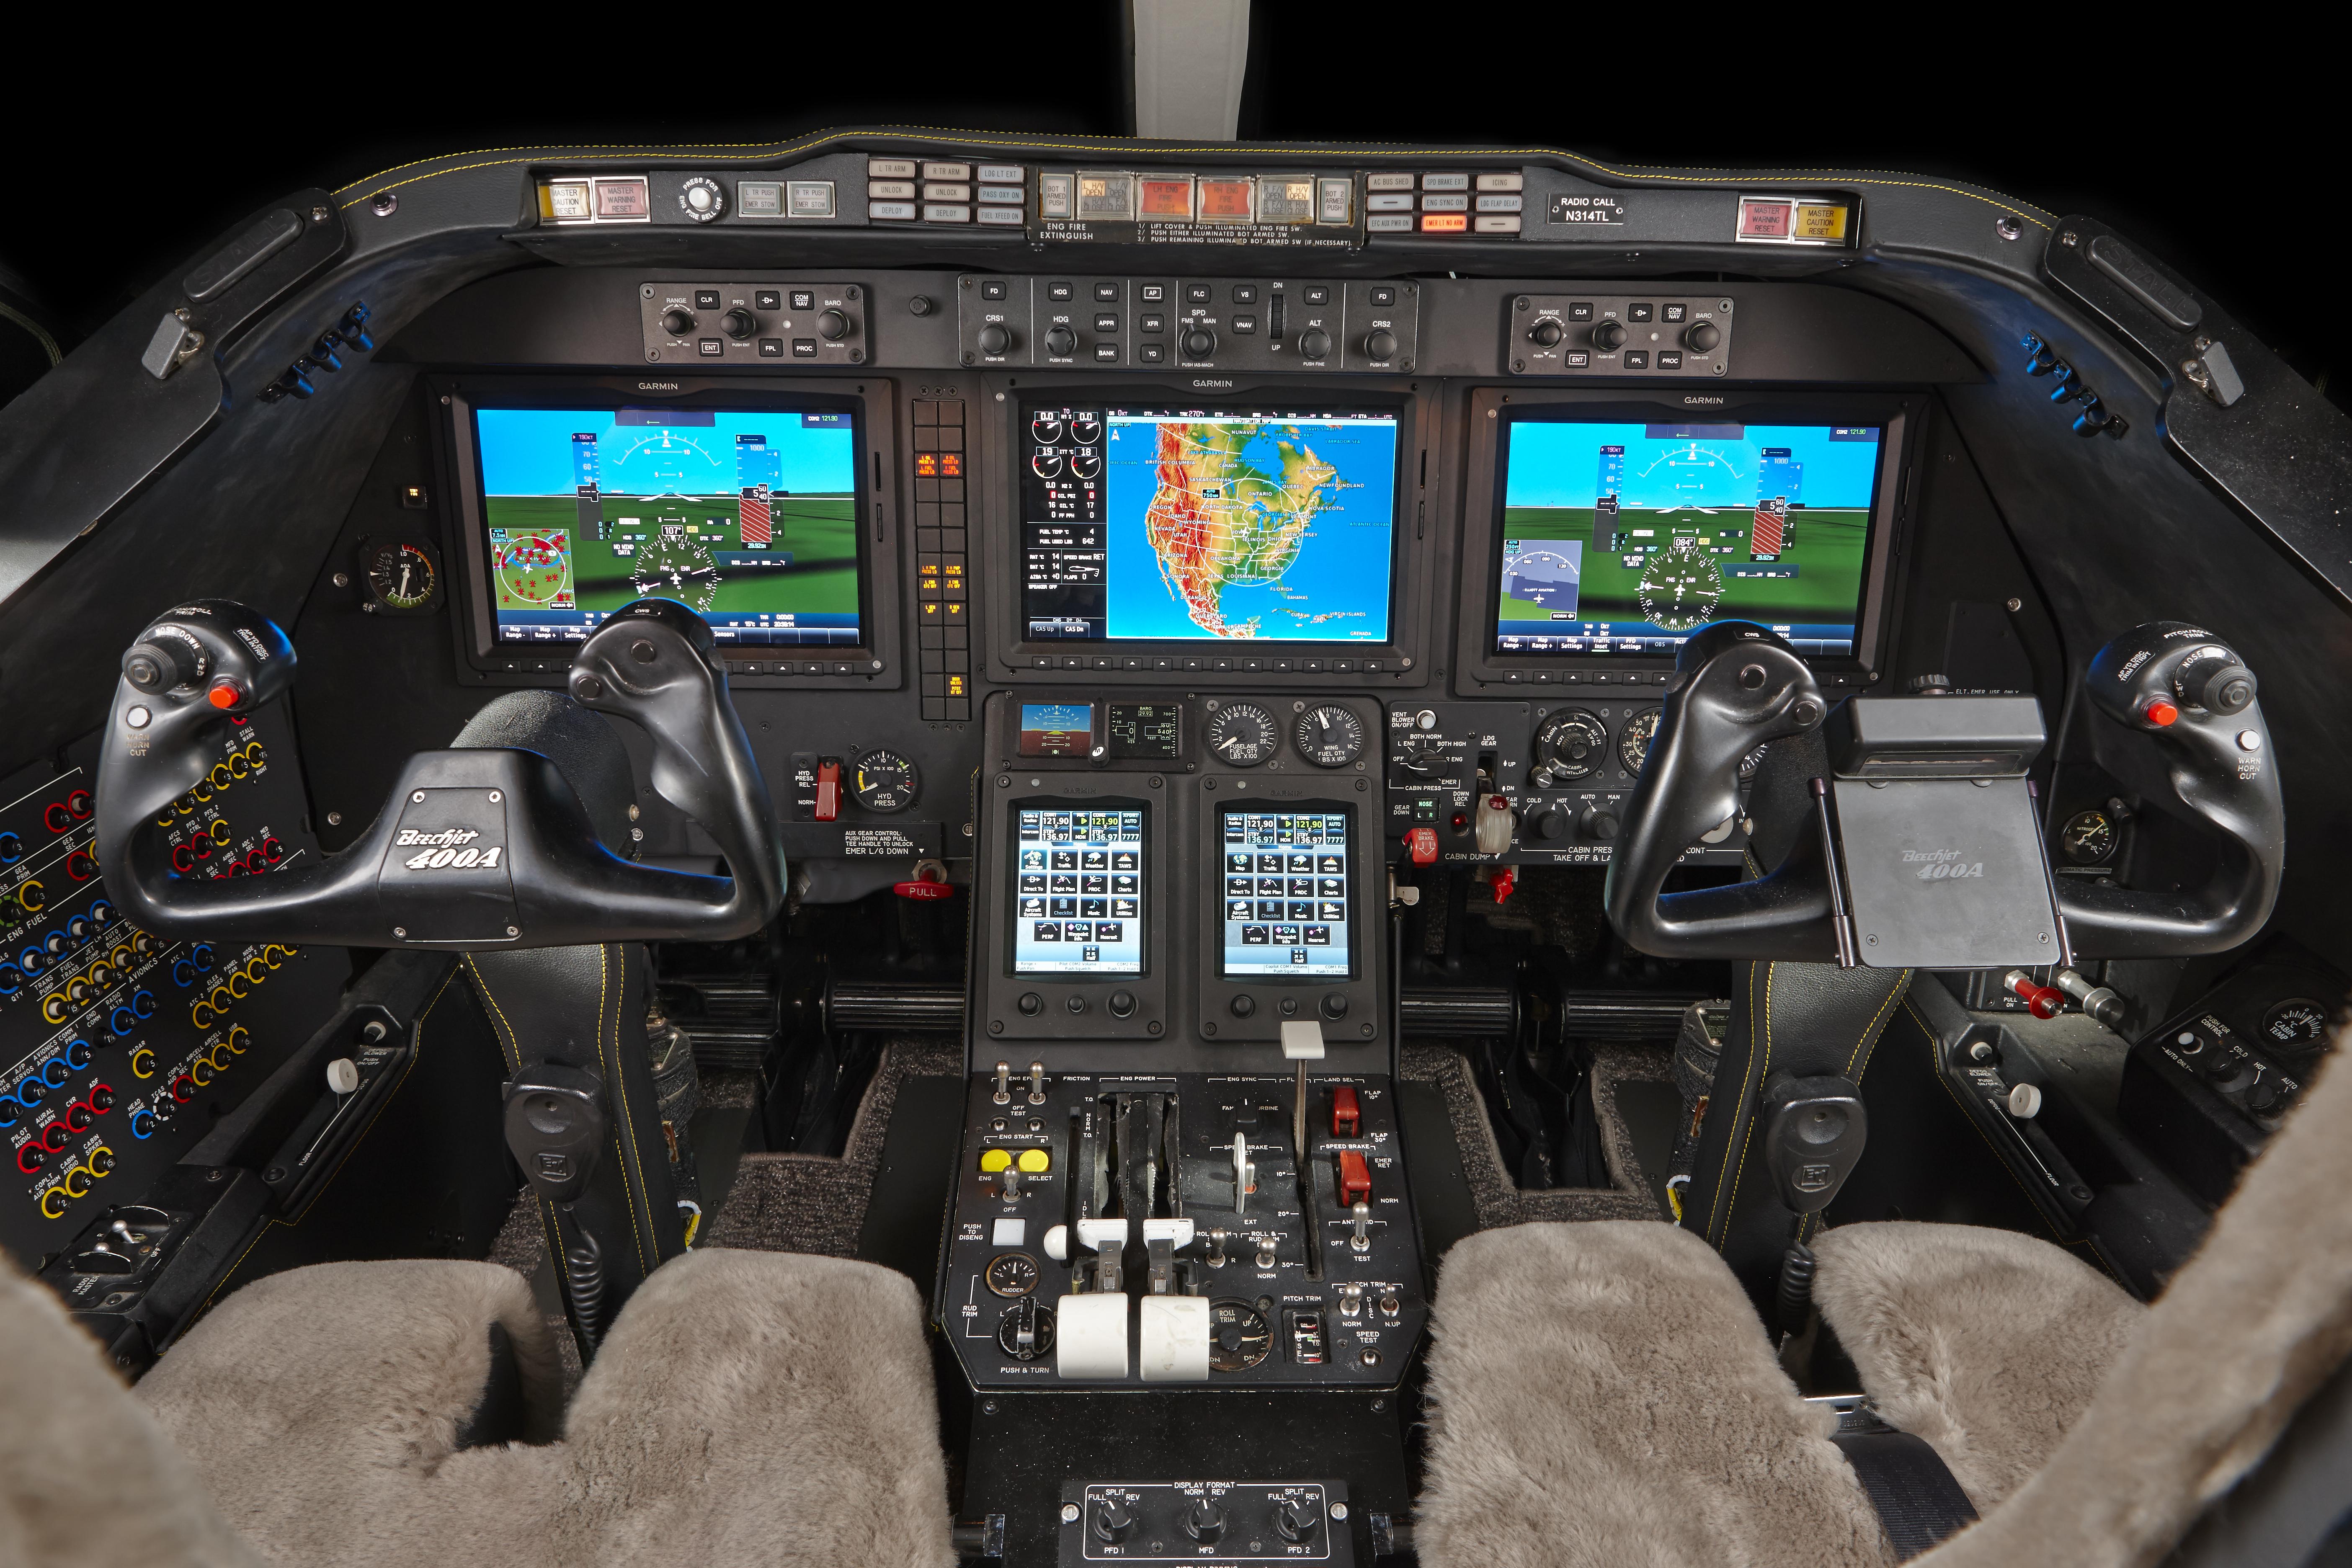 G5000 Avionics